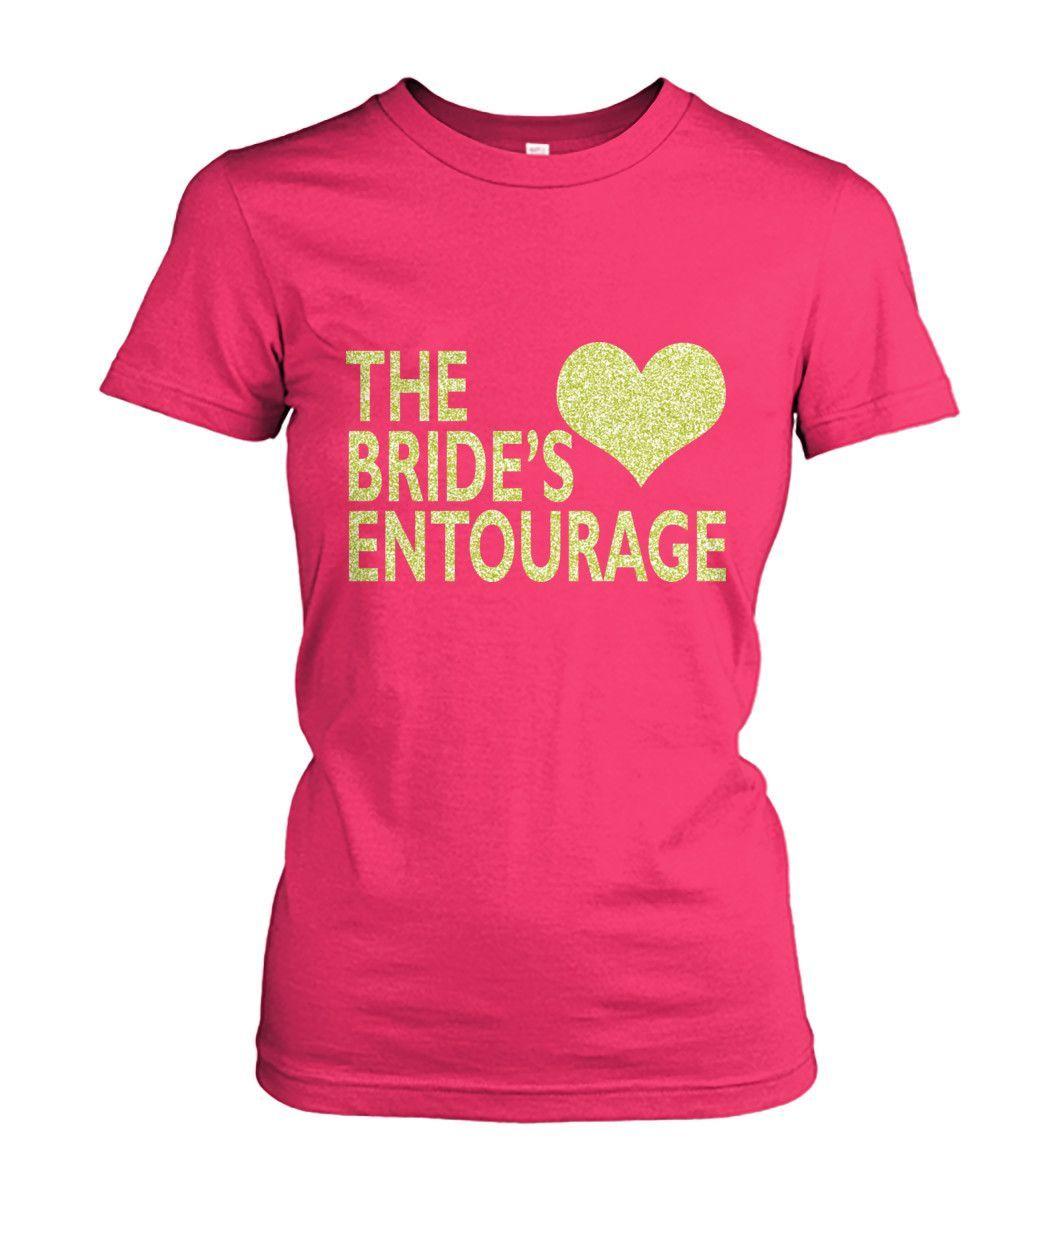 Wedding Entourage Hairstyle: Bridesmaids Bridal Party Shirts, The Bride's Entourage